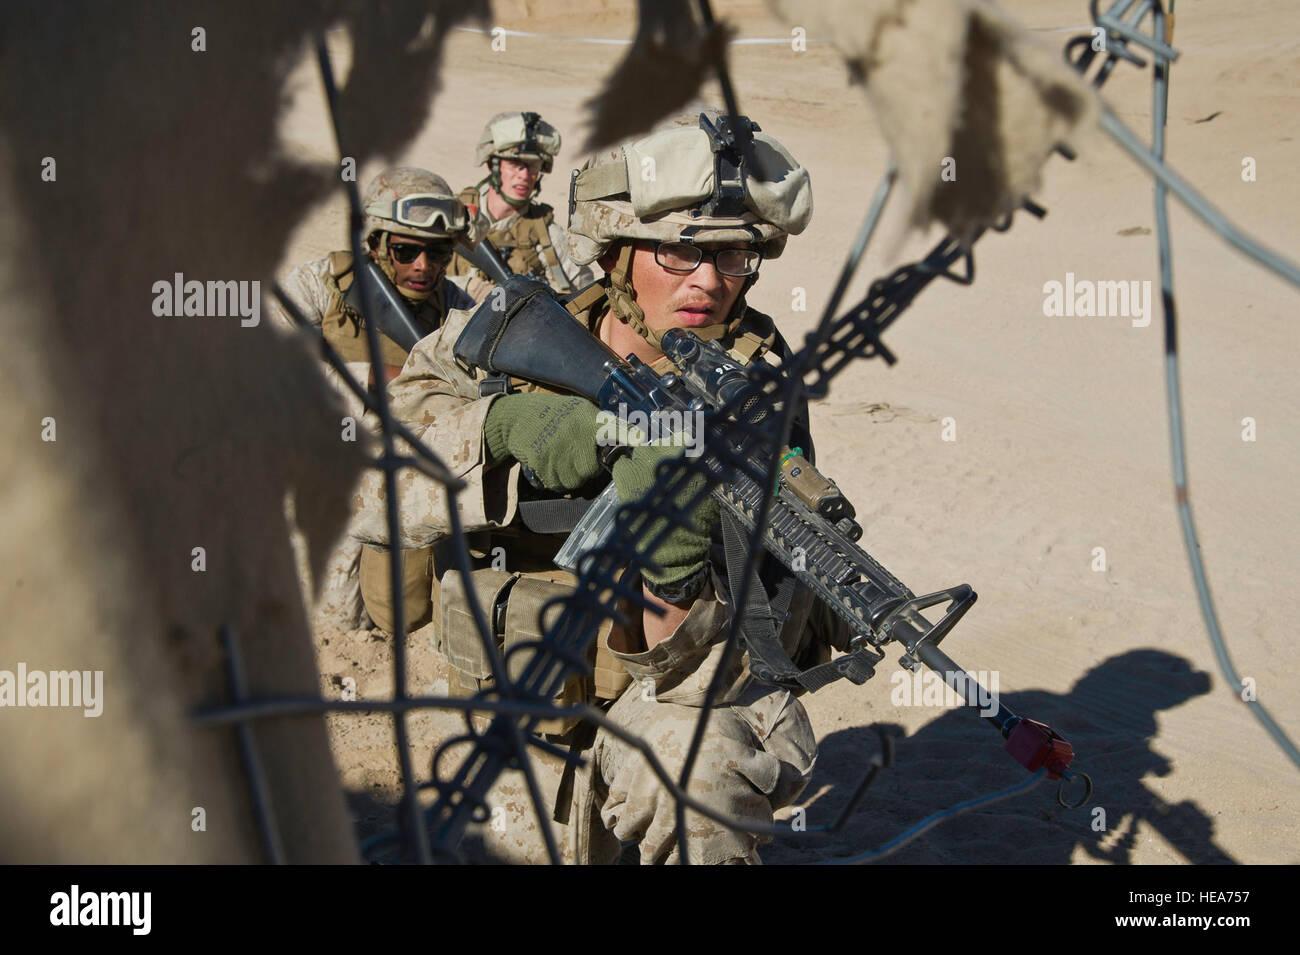 U.S. Marines assigned to 1st Marine Logistics Group, Marine Corps Base Camp Pendleton, Calif., take cover behind Stock Photo